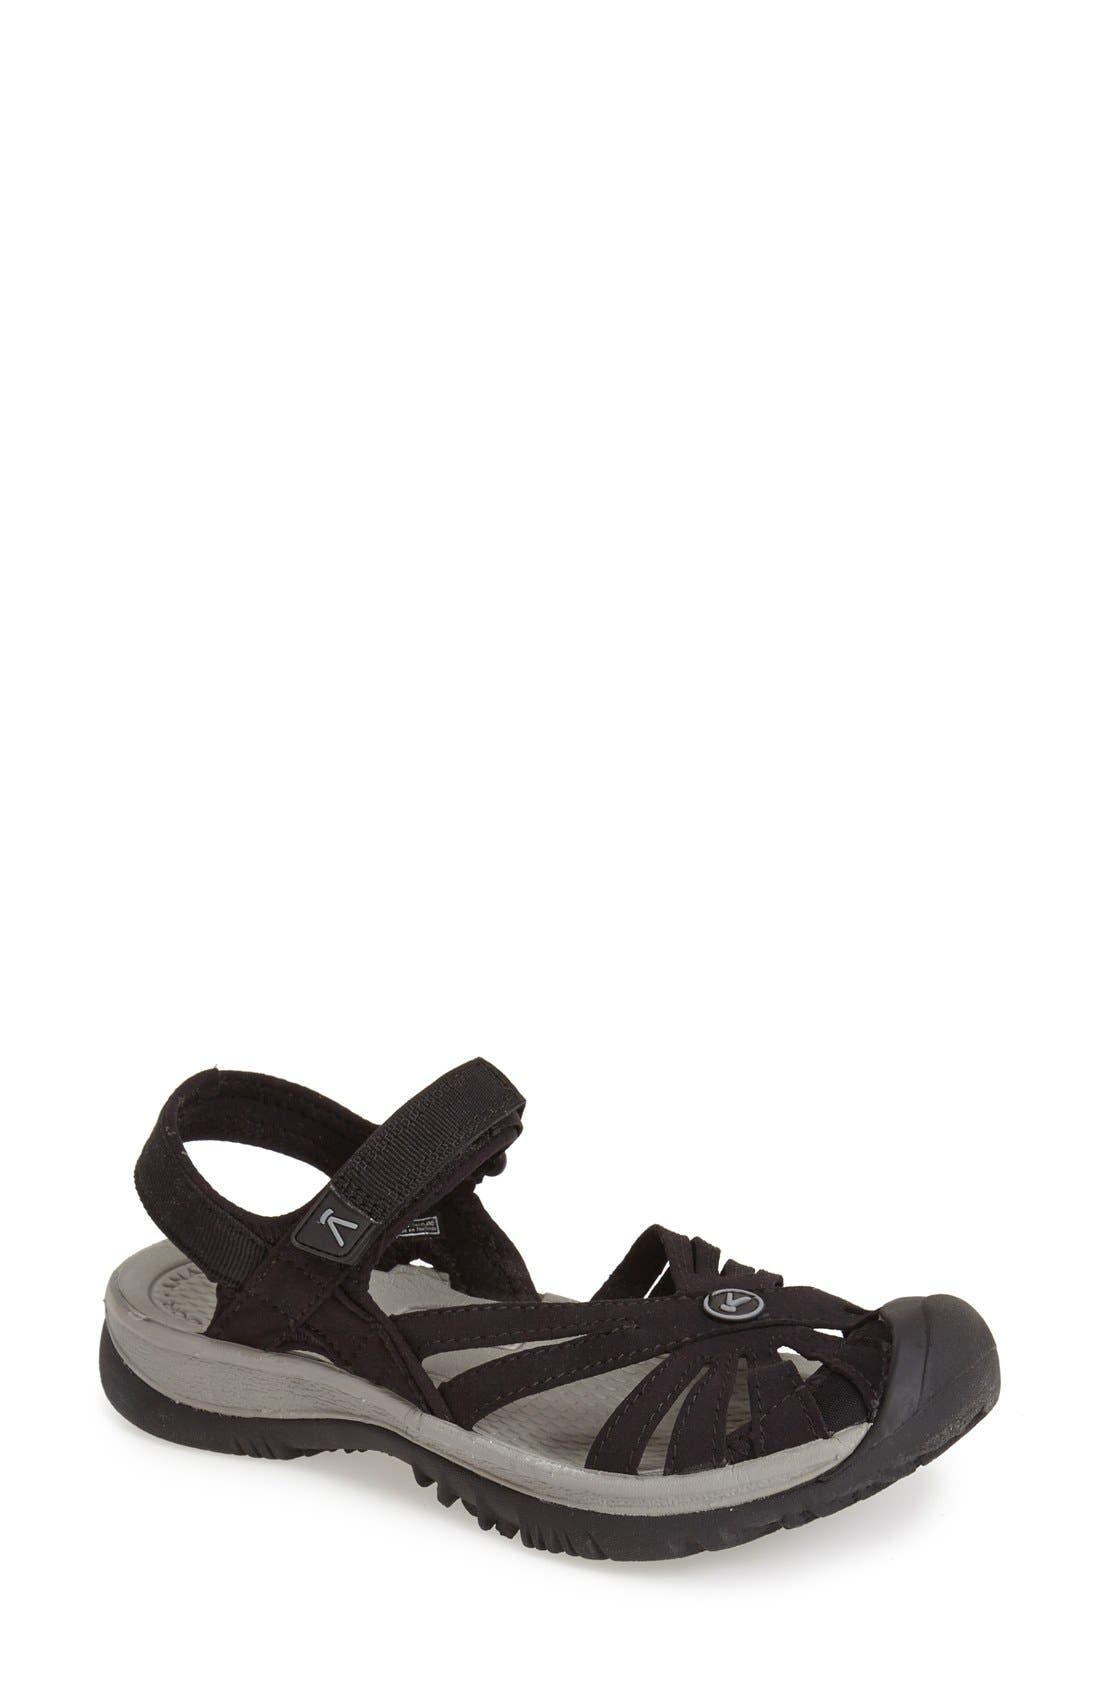 'Rose' Sandal,                         Main,                         color, BLACK/ GREY